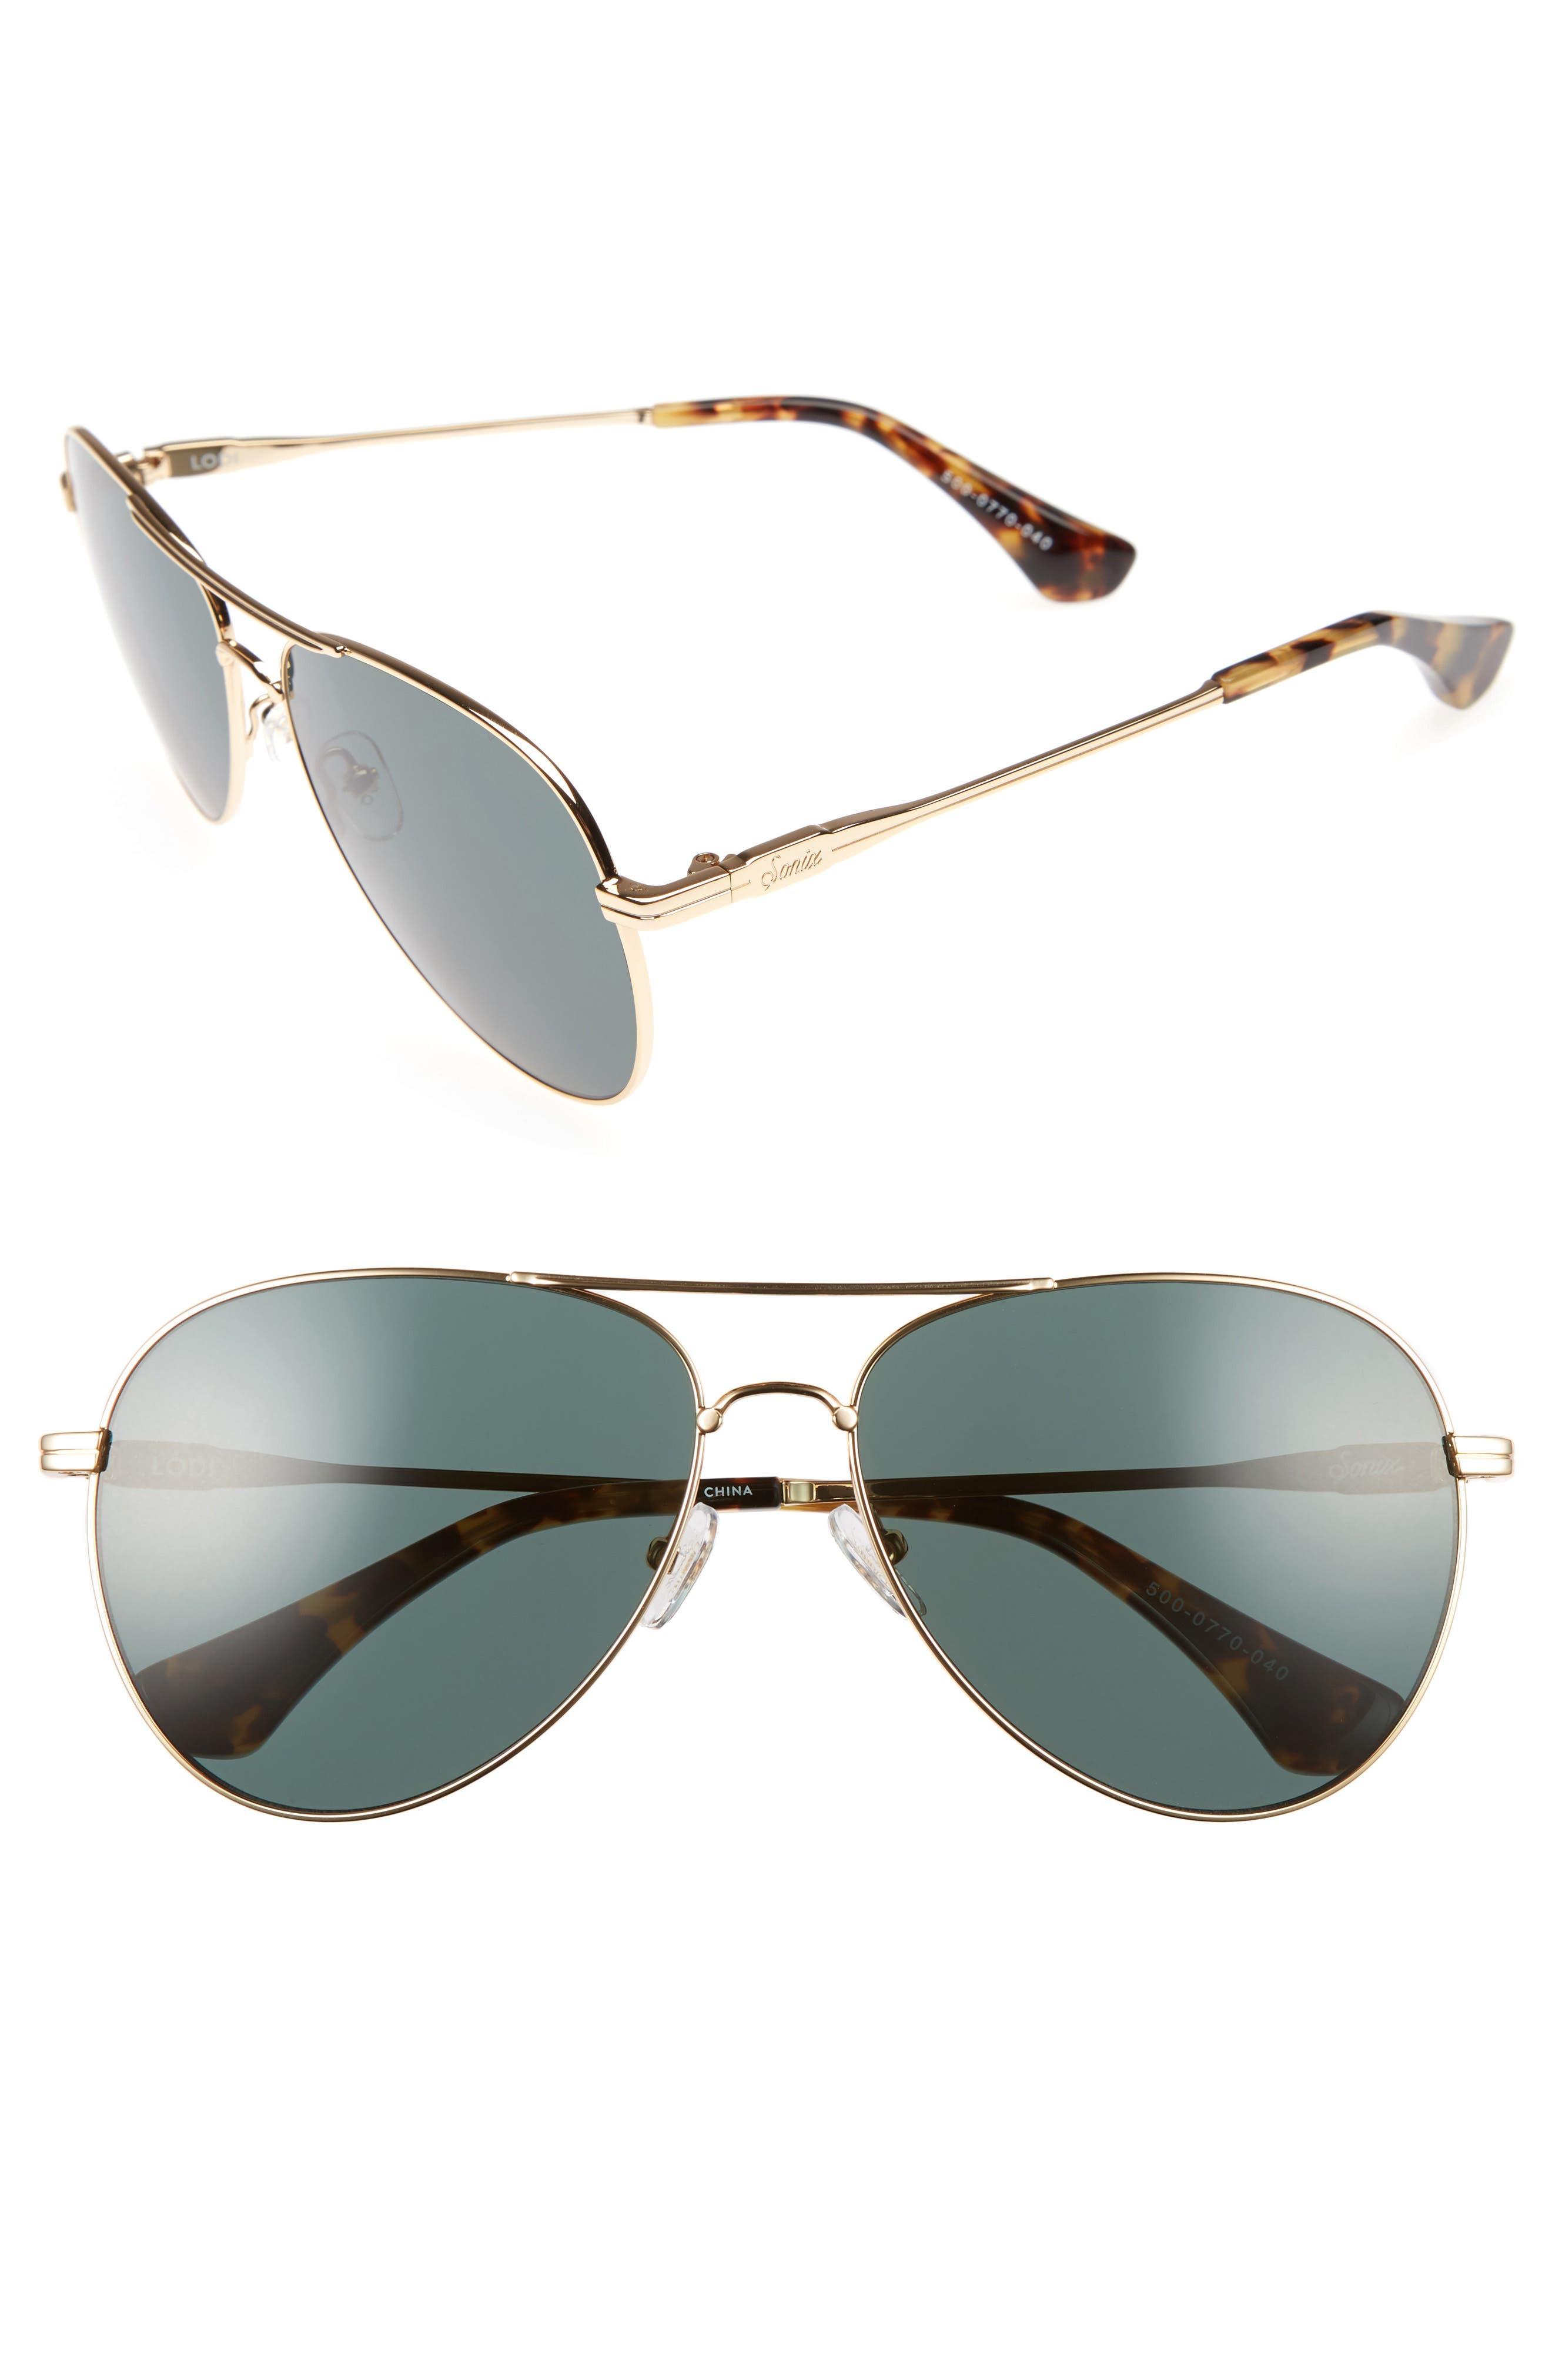 Lodi 62mm Mirrored Aviator Sunglasses,                             Alternate thumbnail 6, color,